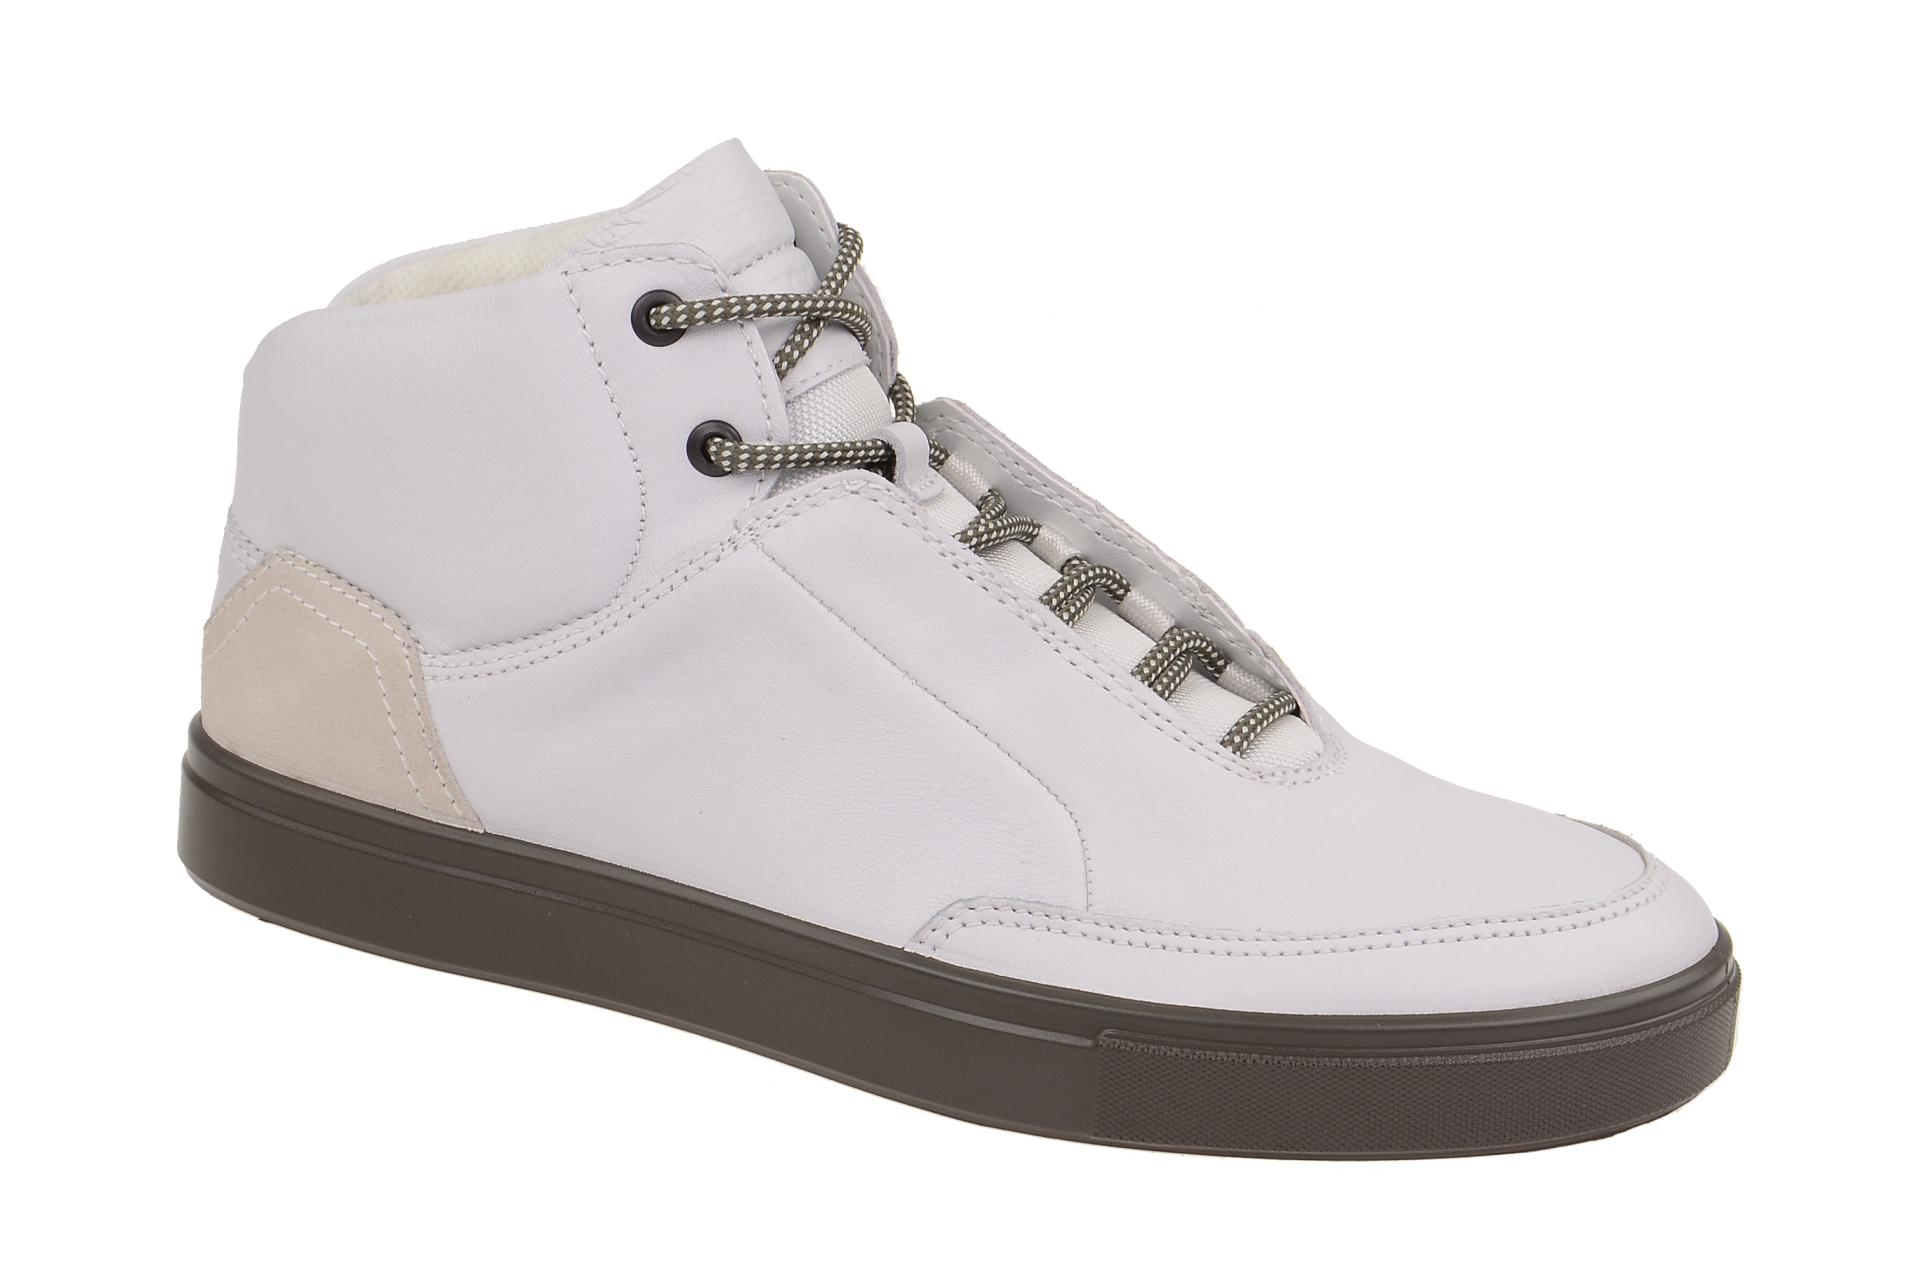 79d05193d9d19b Ecco Kyle Sneaker weiß Herren Boots - Schuhhaus Strauch Shop